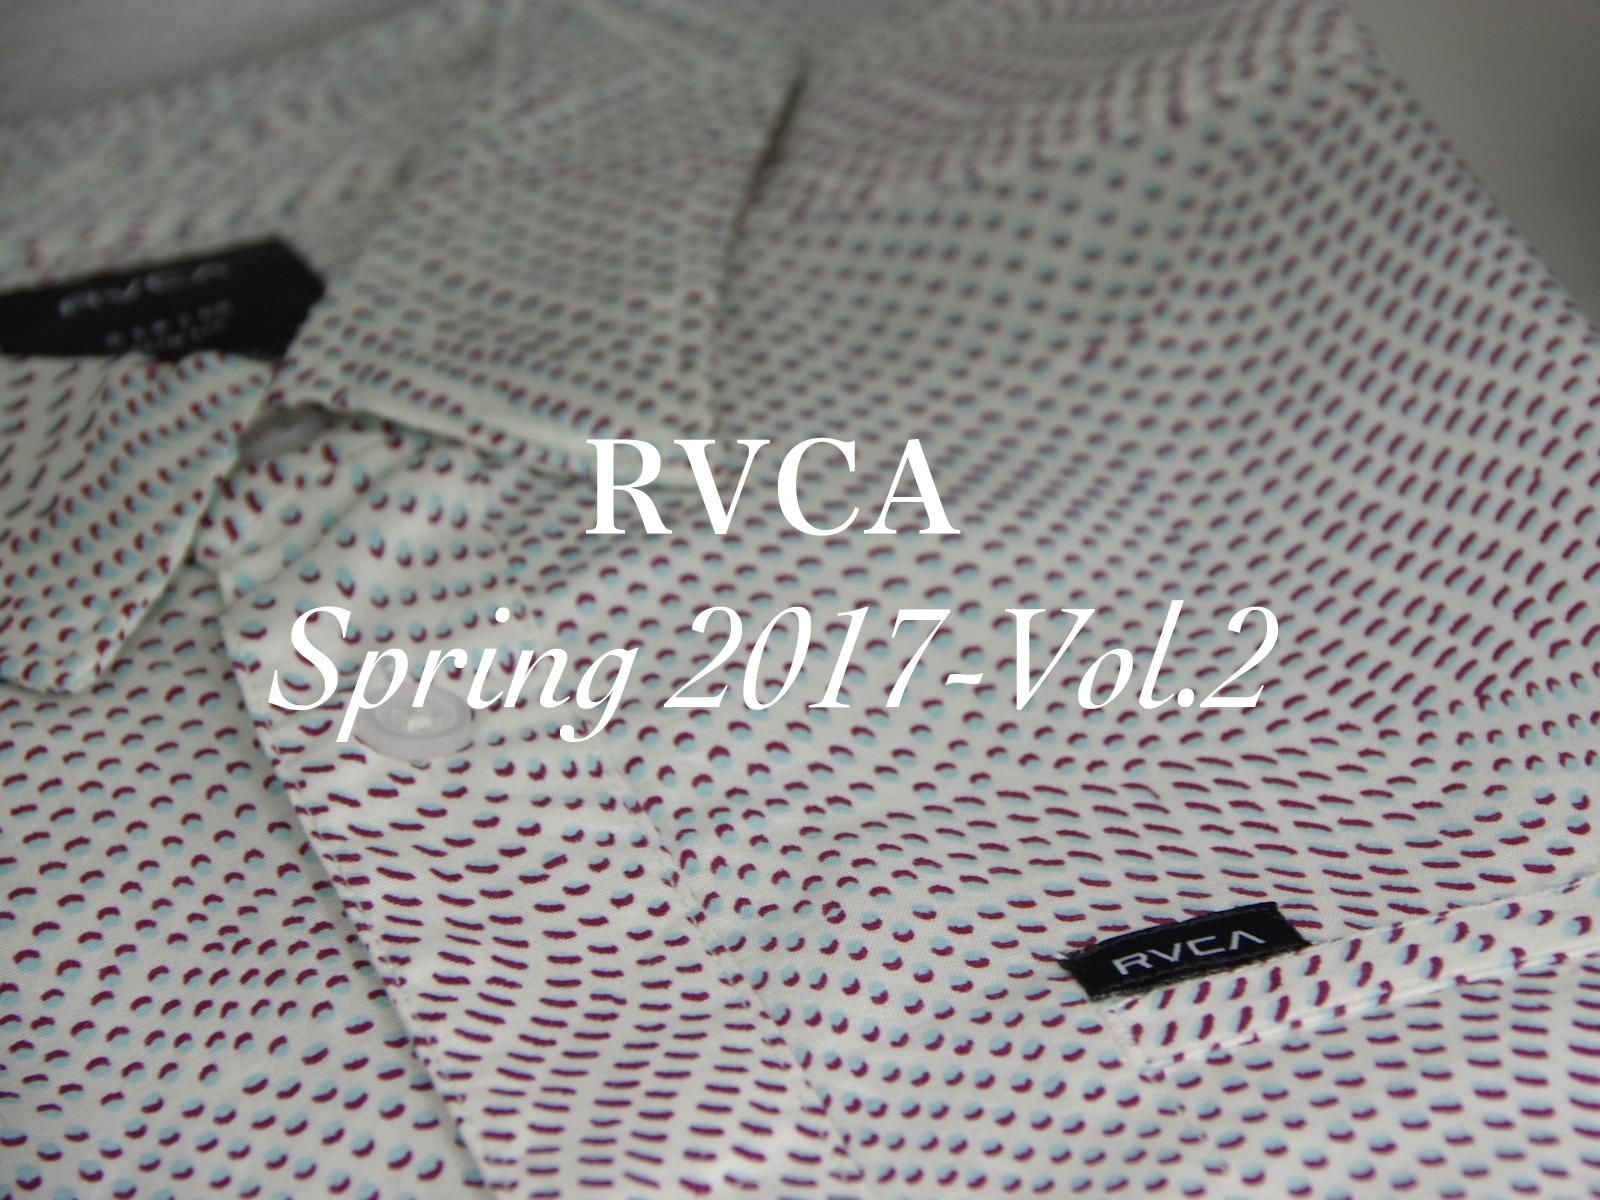 RVCA SPRING 2017 第二弾入荷!